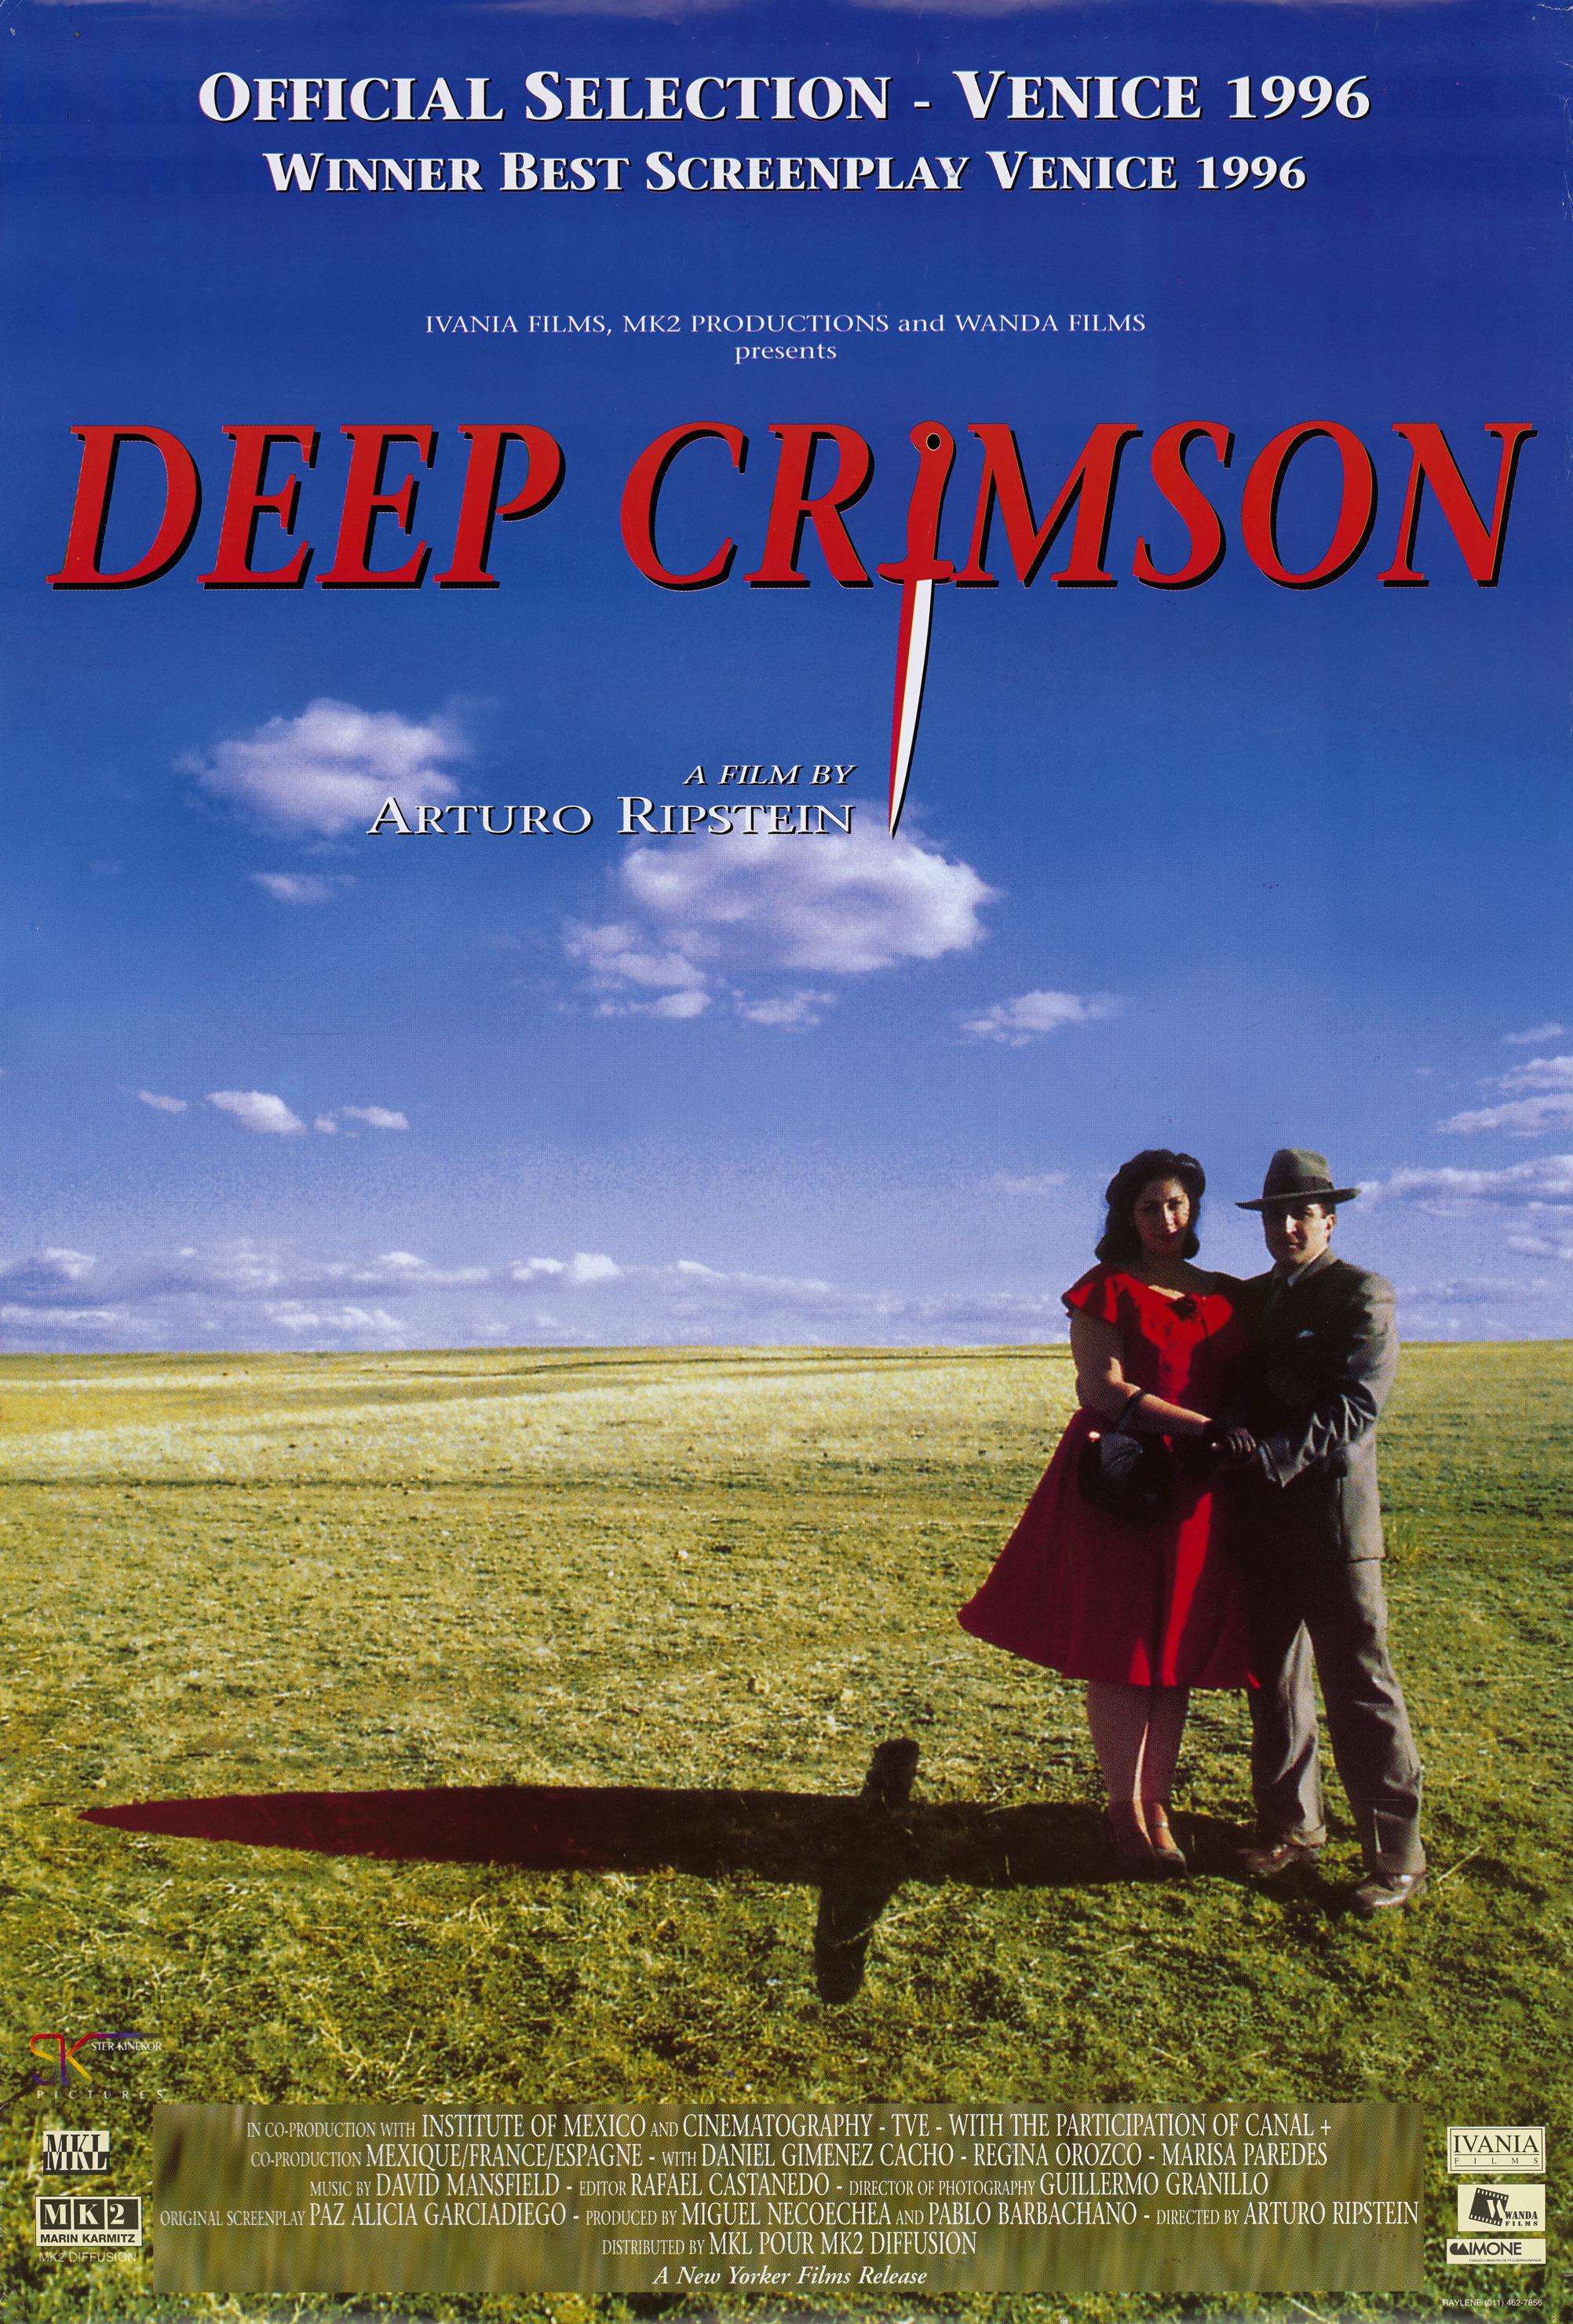 DEEP CRIMSON (1996)